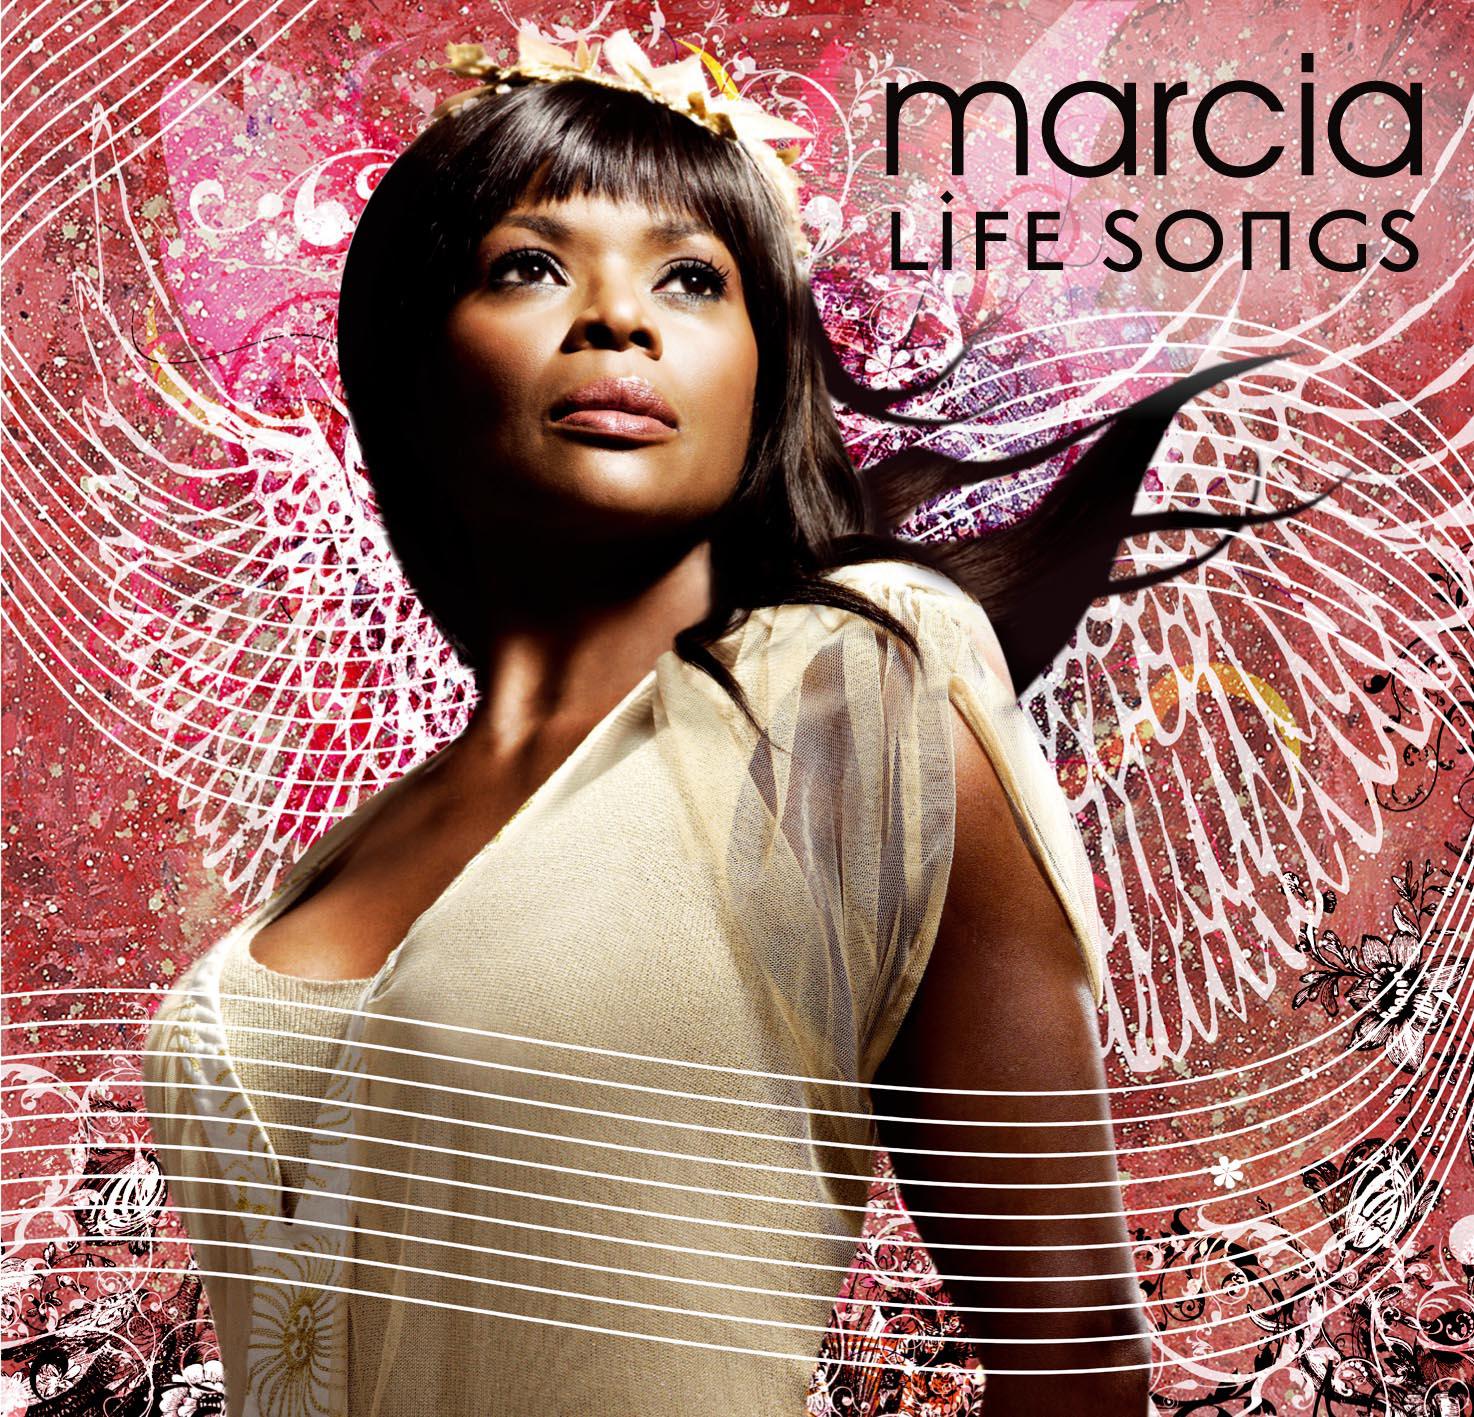 Marcia_Cover.jpg